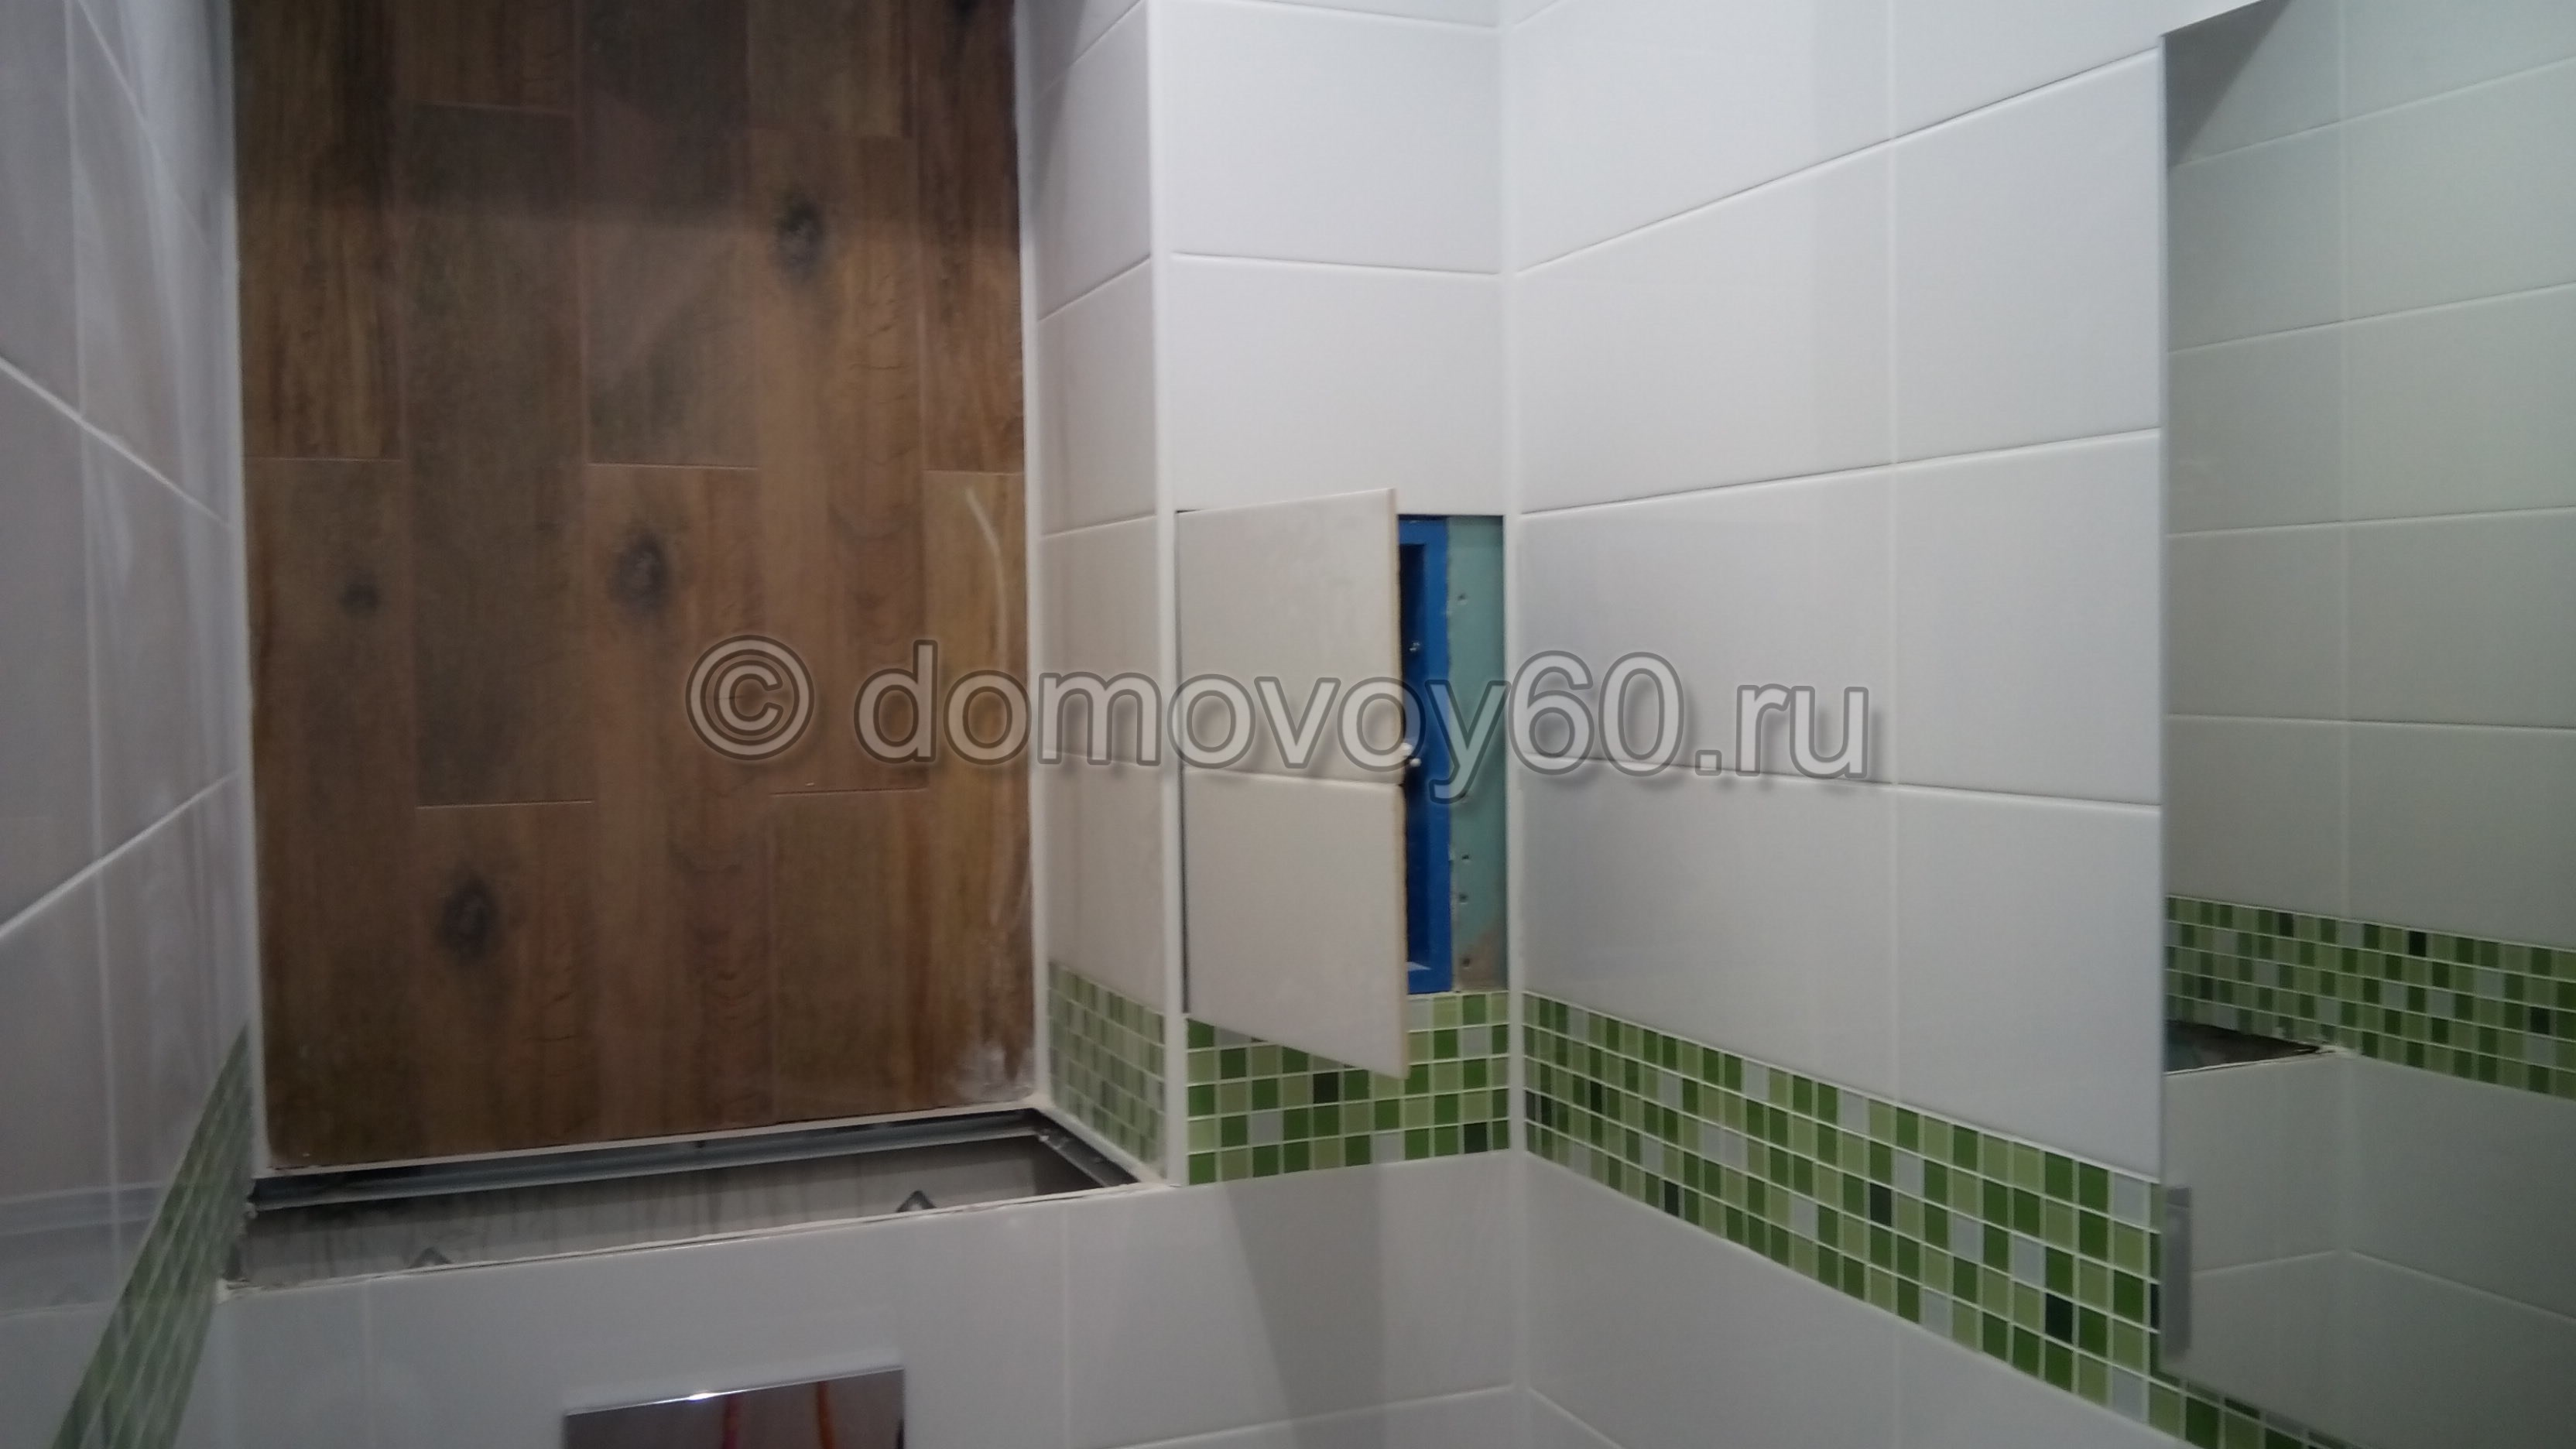 domovoy60-109